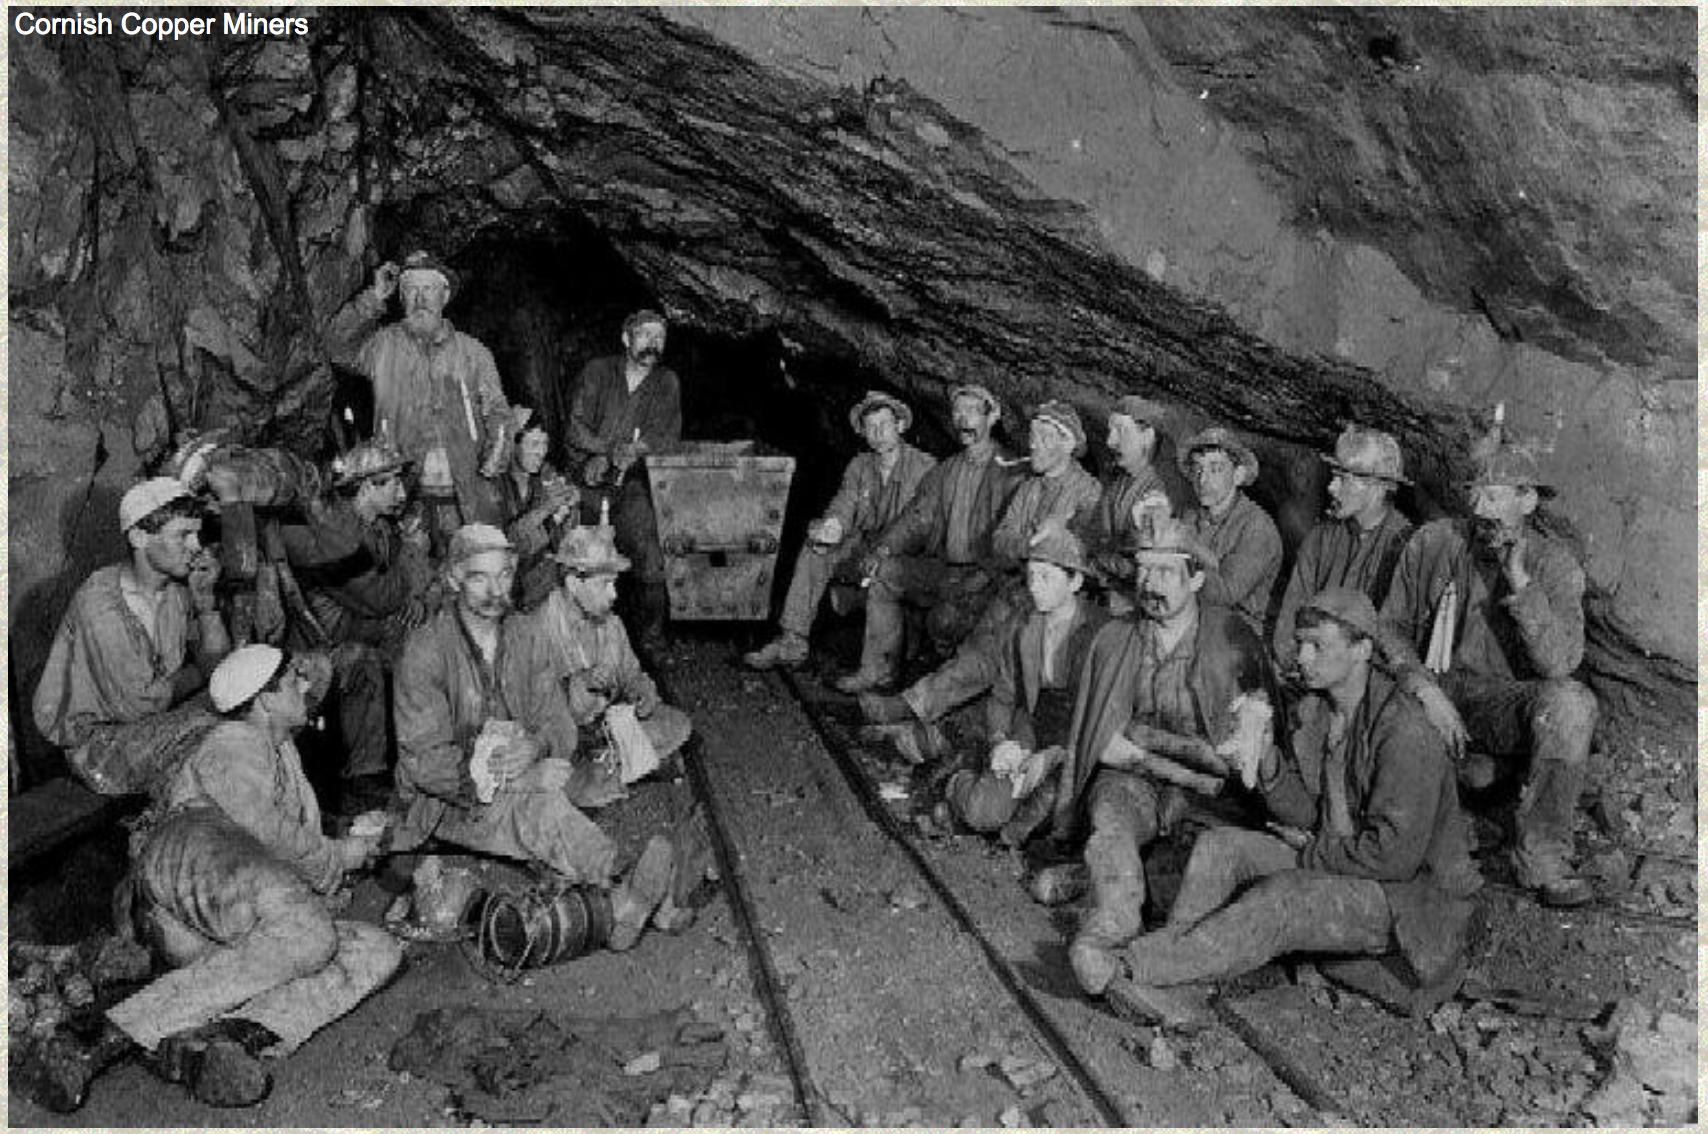 Cornish copper miners. Credit miningartifacts.org